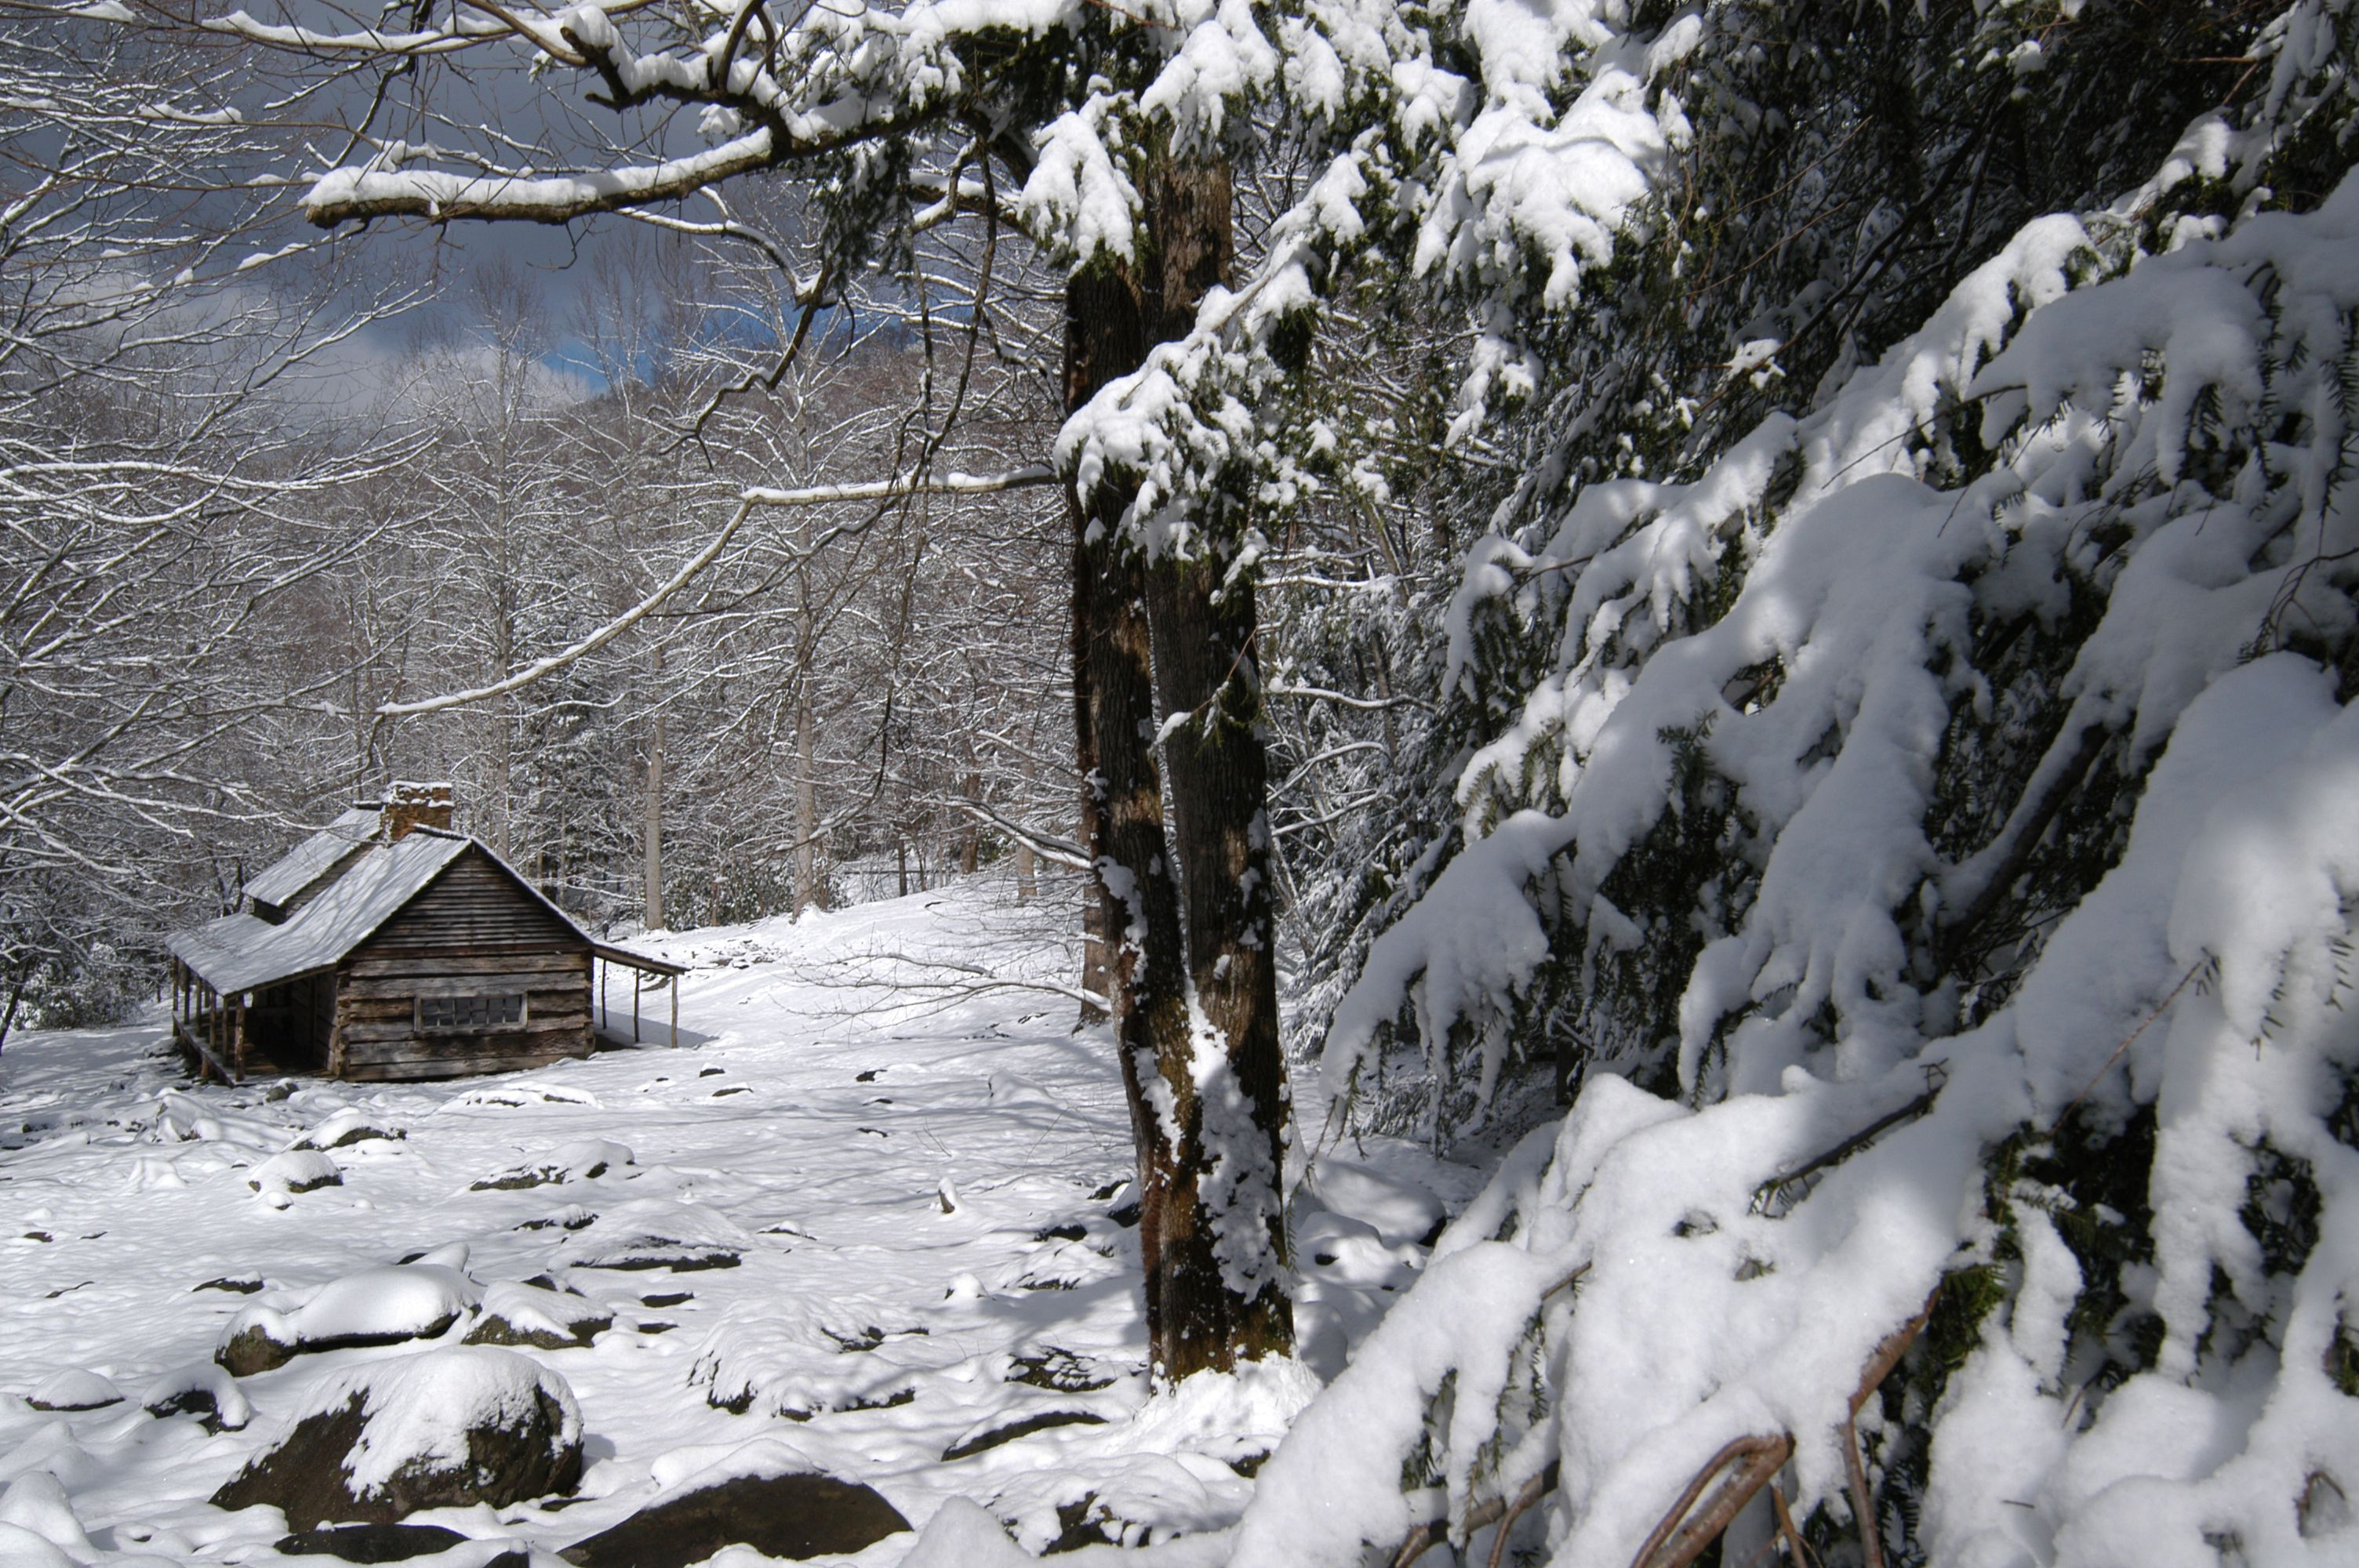 Beautiful winter scene in the Smoky Mountains